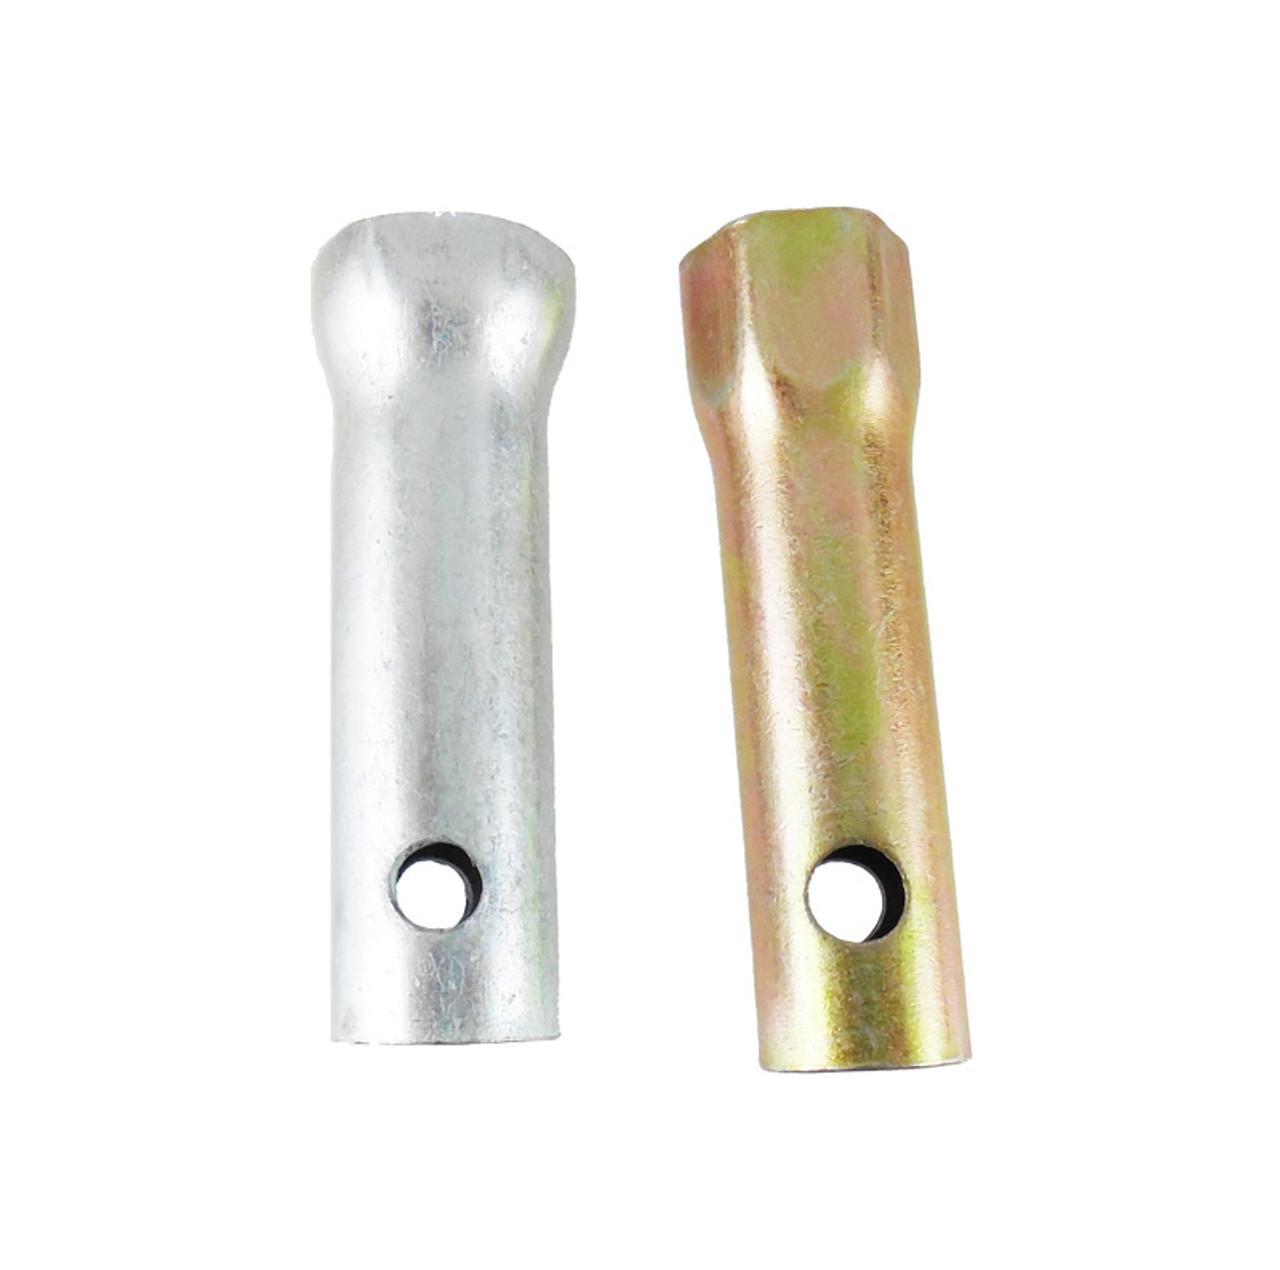 Spark Plug Socket for 2 and 4-Stroke Engines